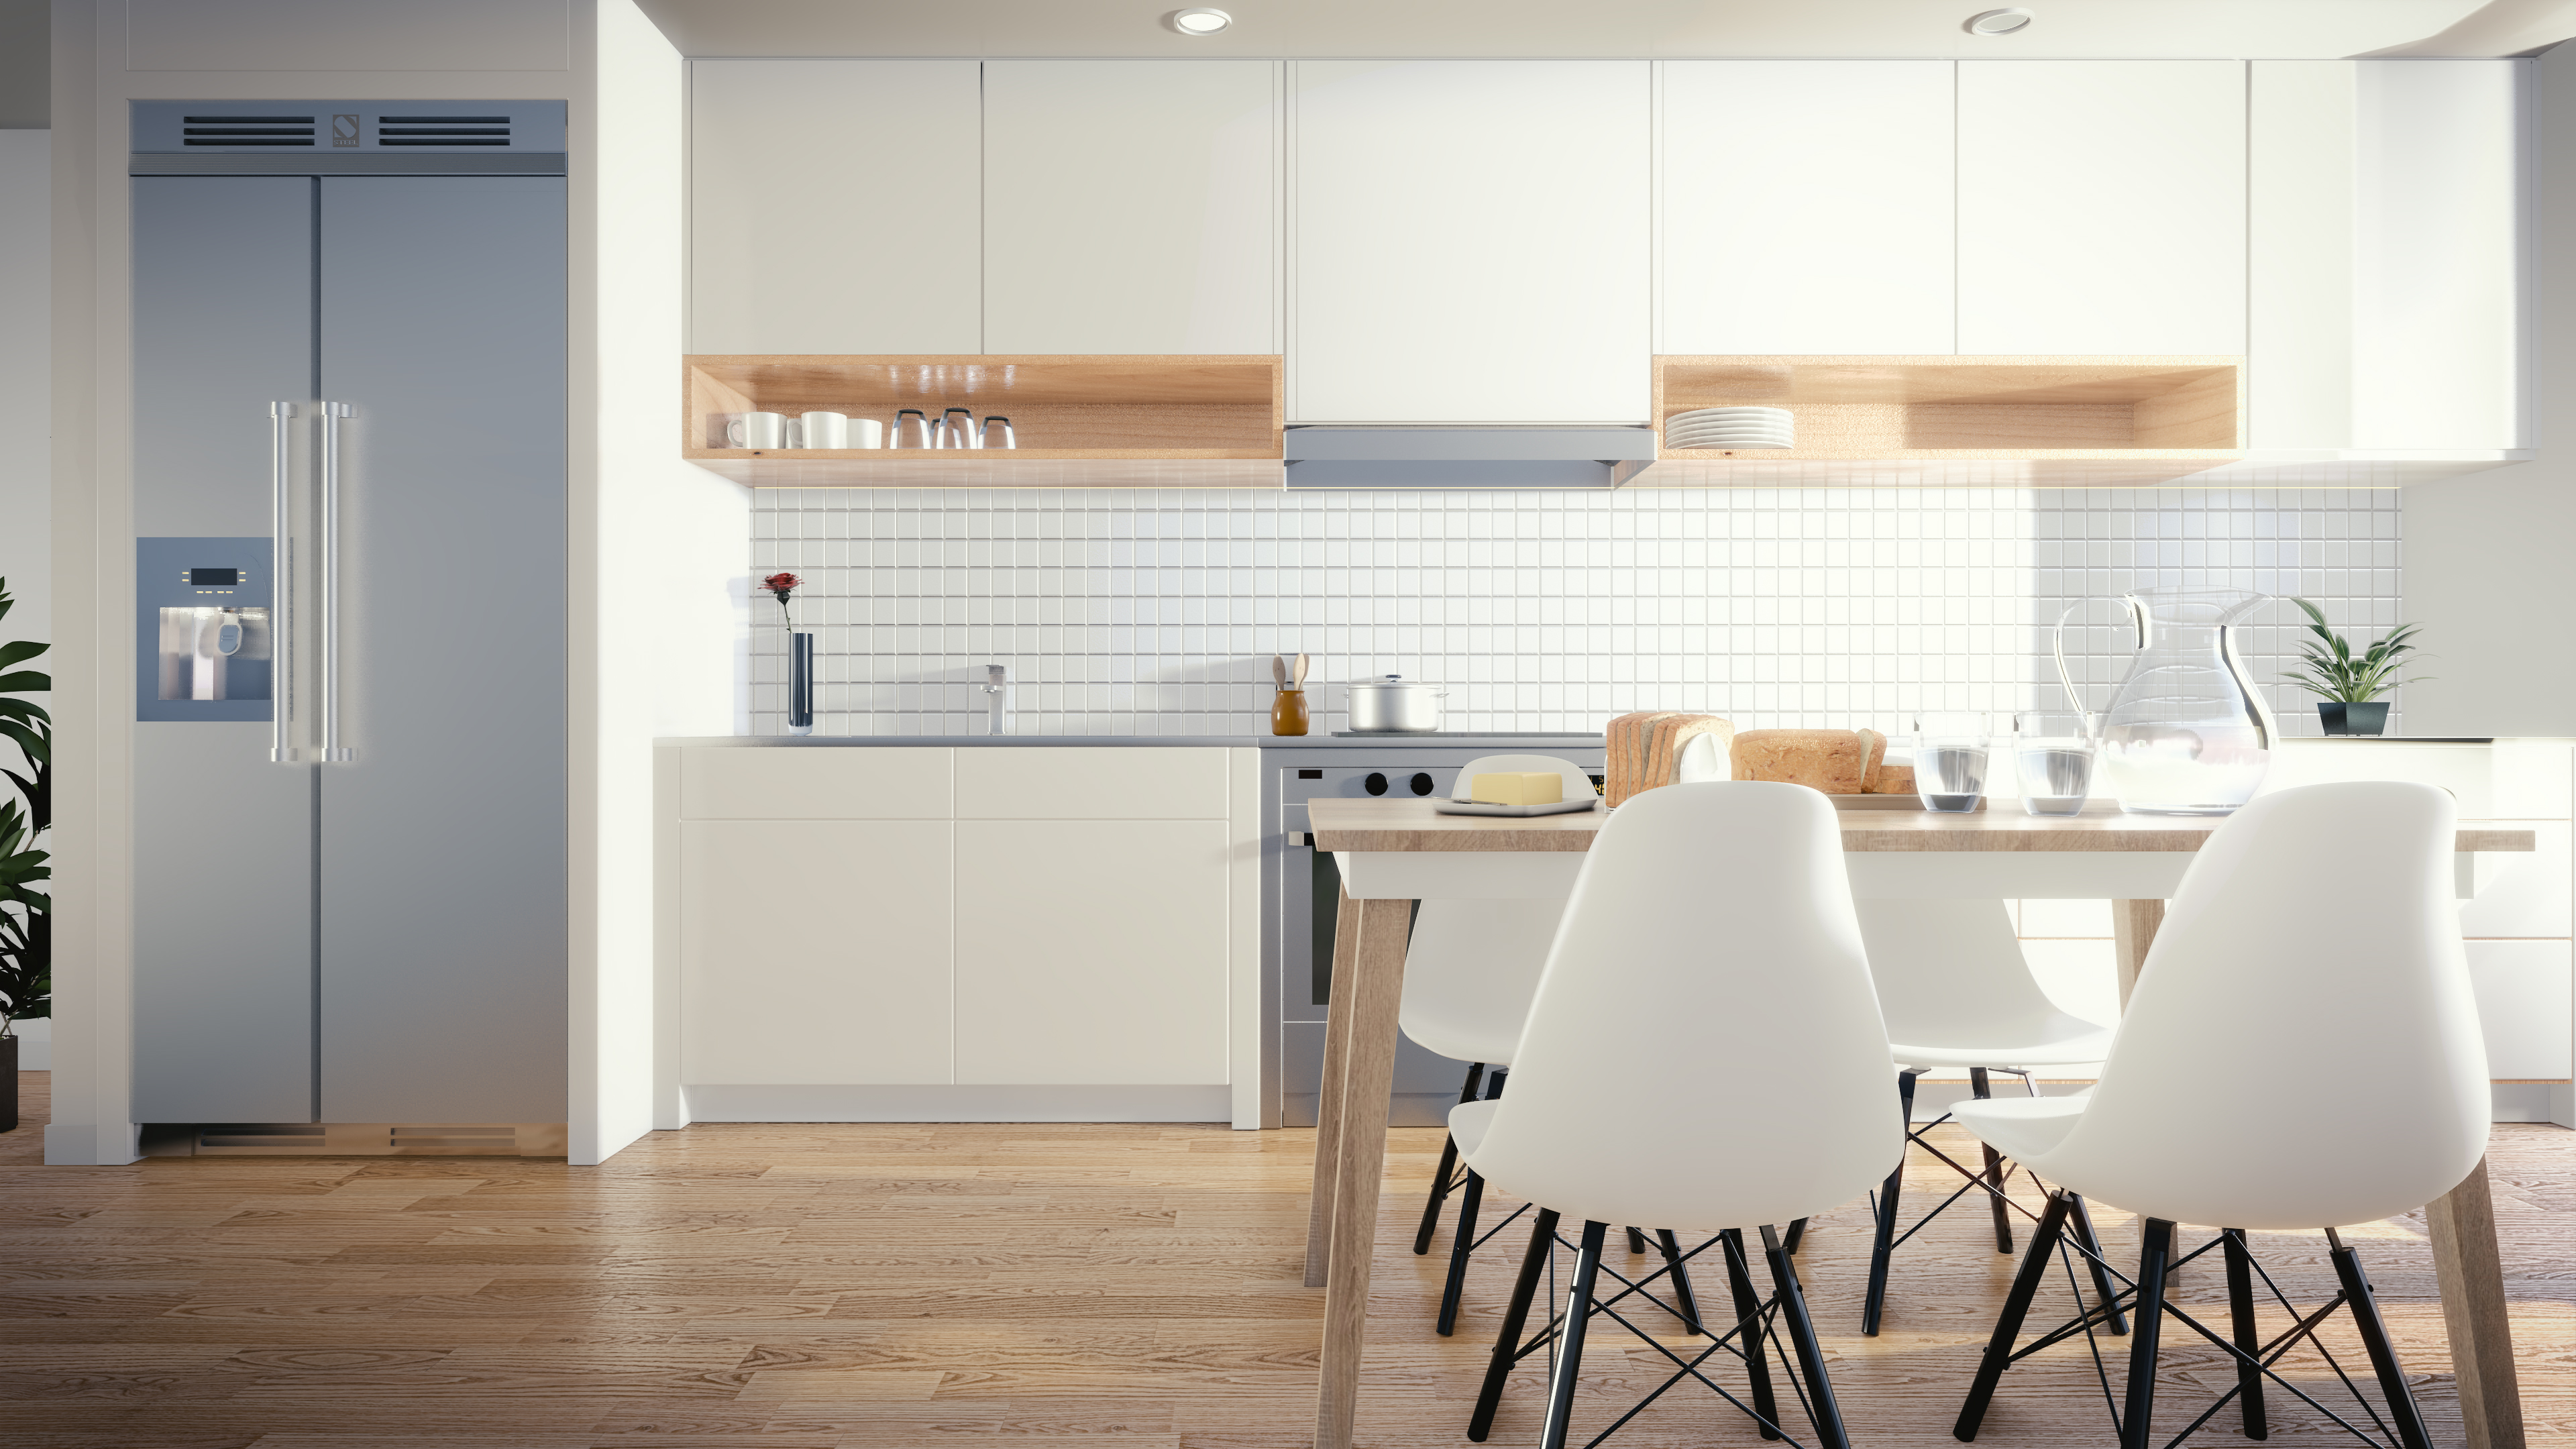 ambientazione-cucina-moderna-varriale-interior-design